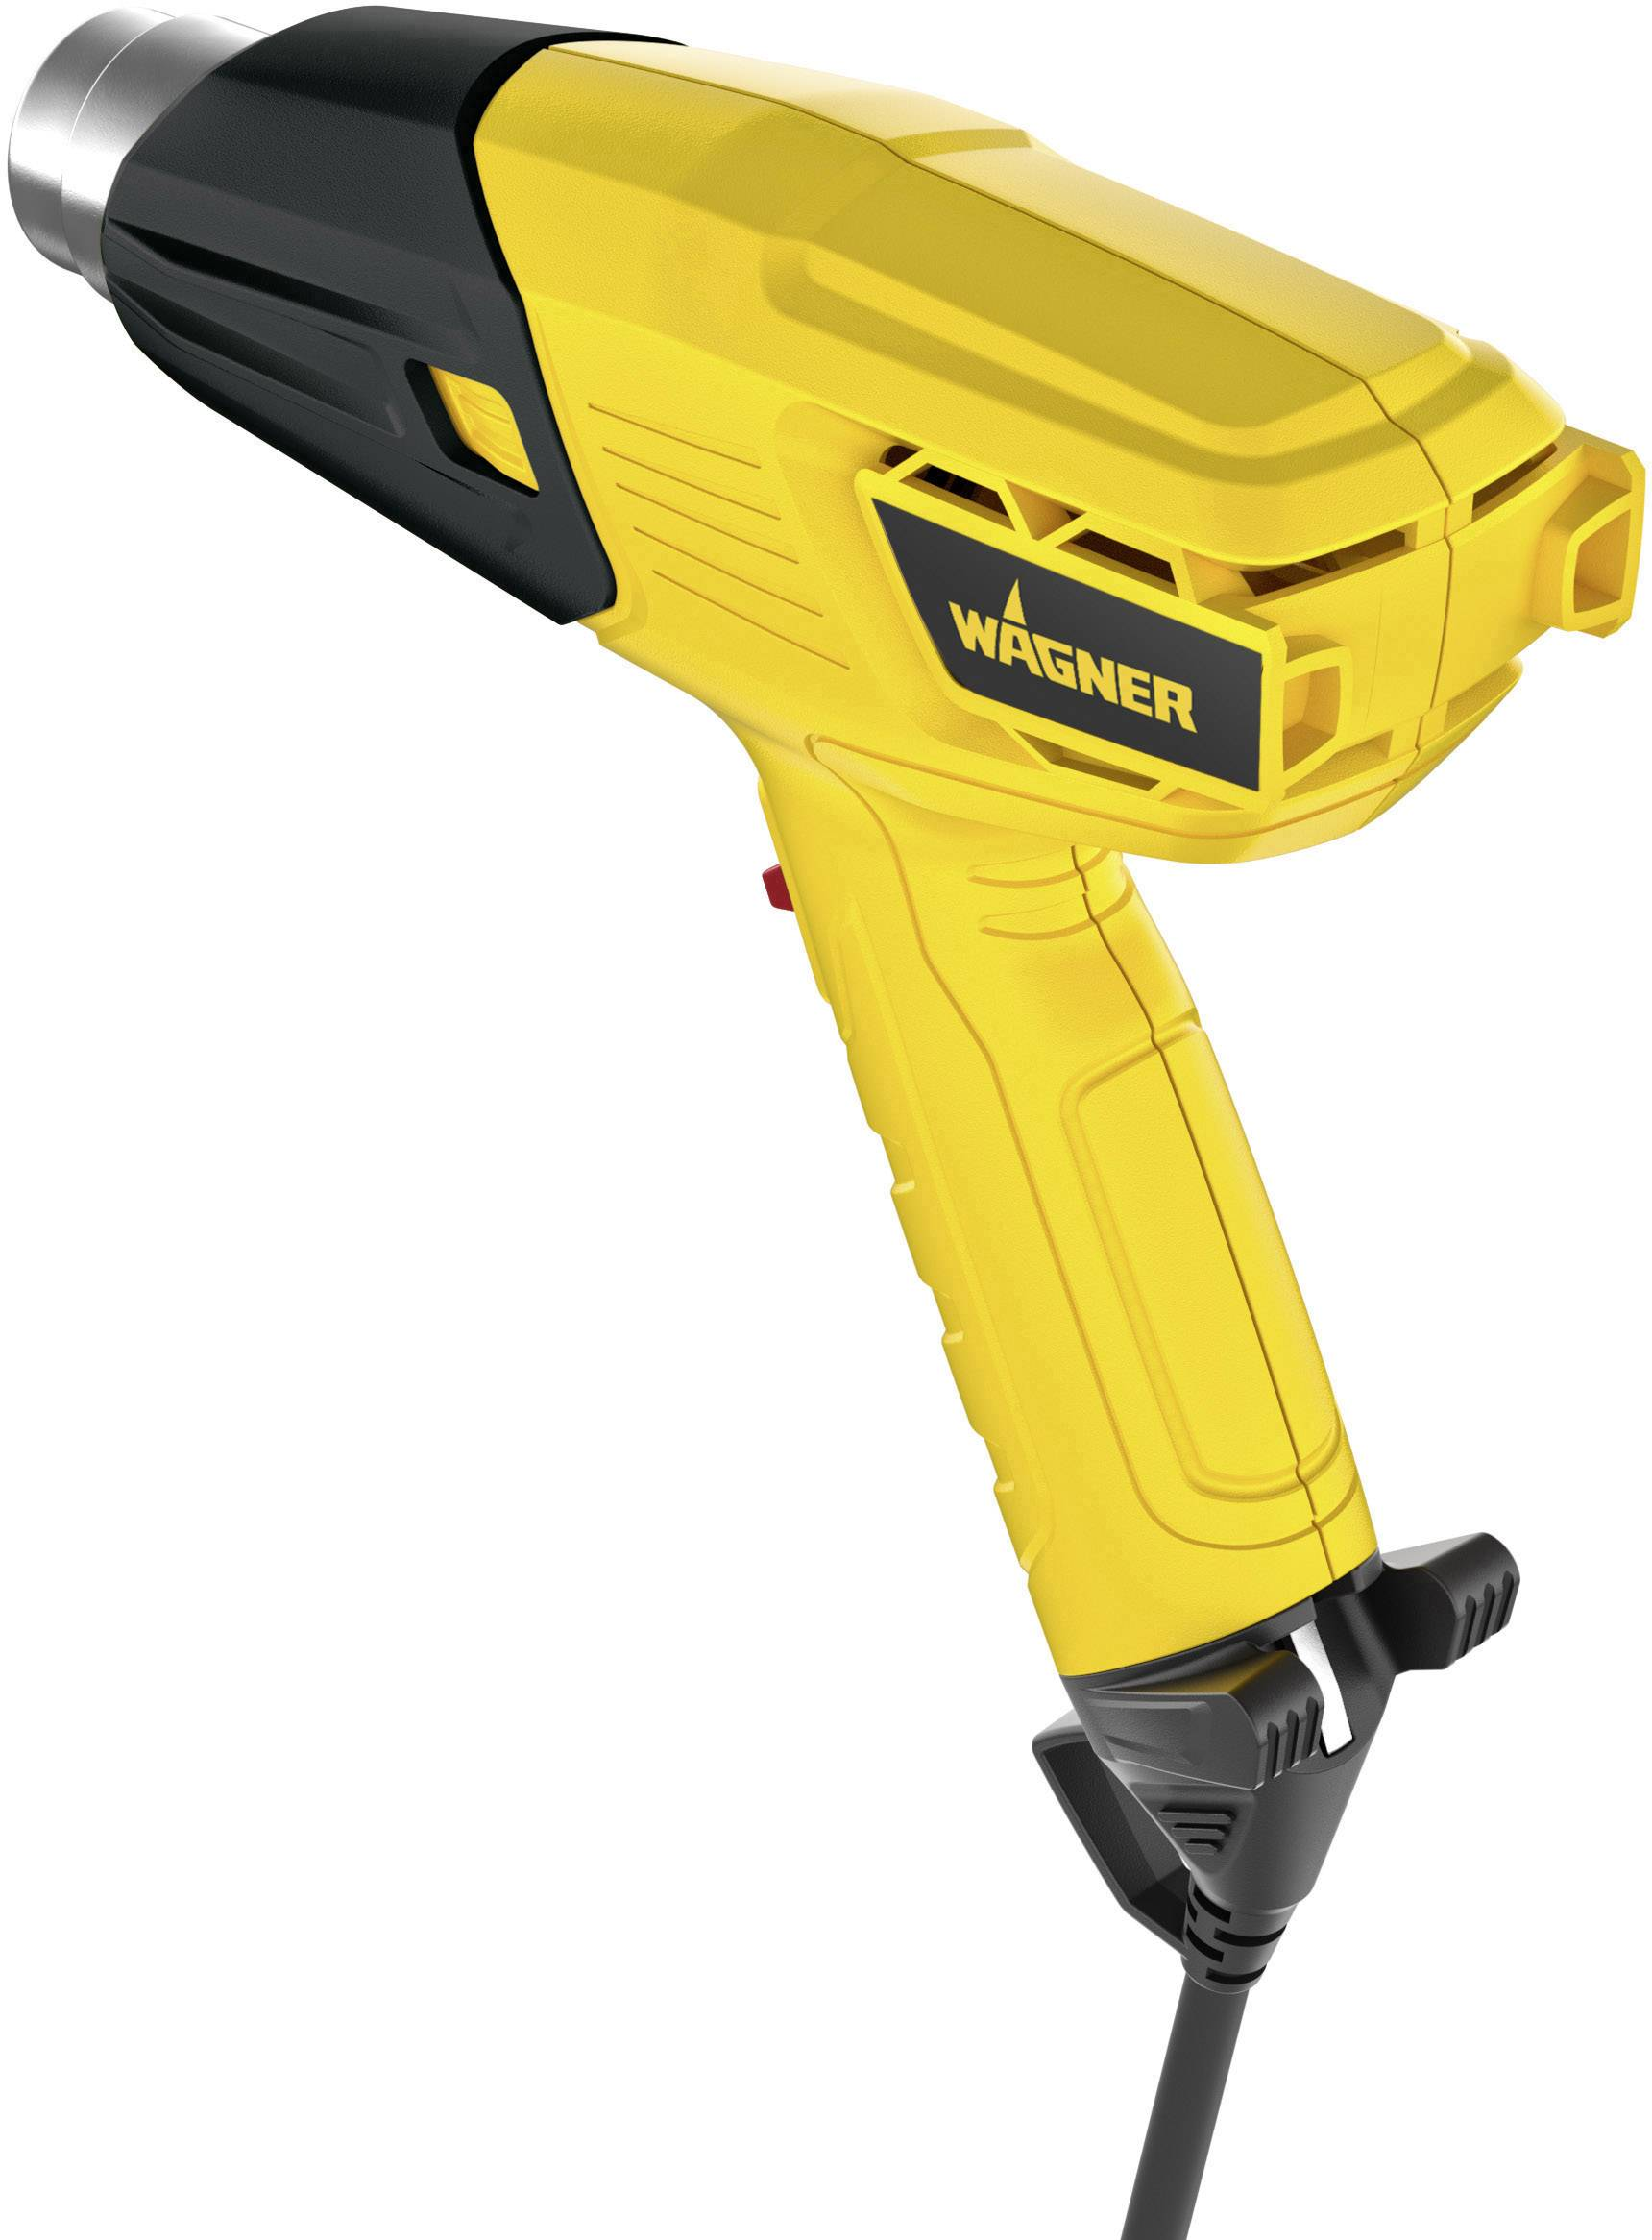 Teplovzdušná pištoľ Wagner Furno 300 2359348, 1600 W, 400 - 575 °C